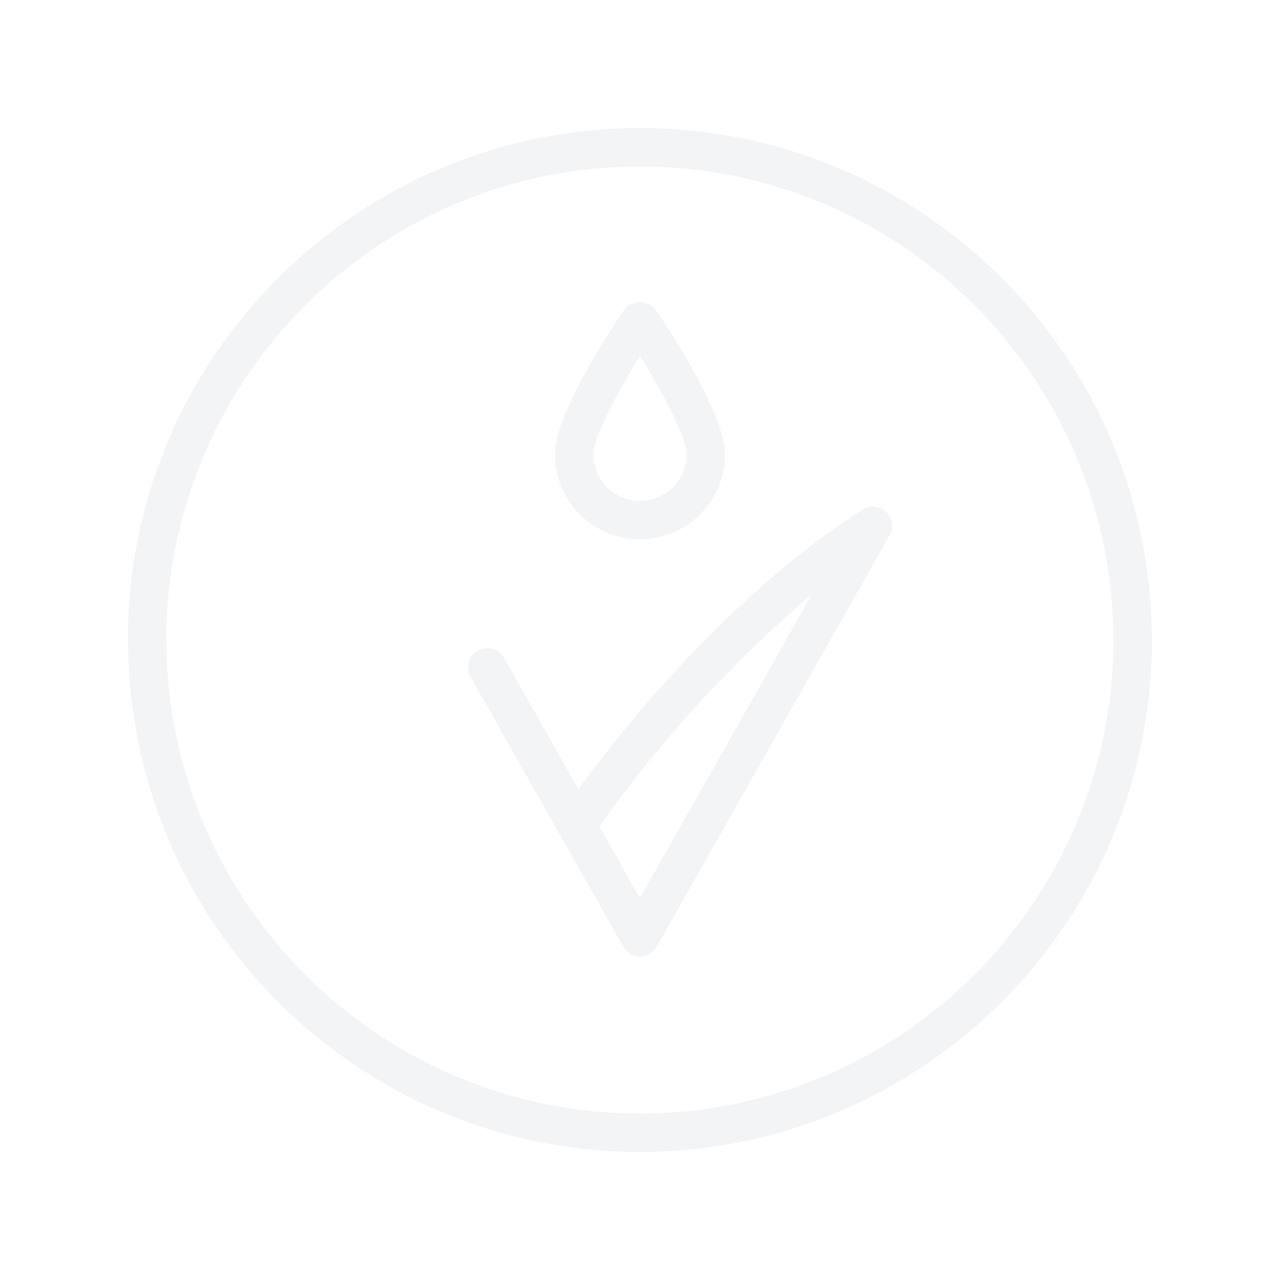 SHOW BEAUTY Lux Volume Shampoo 200ml